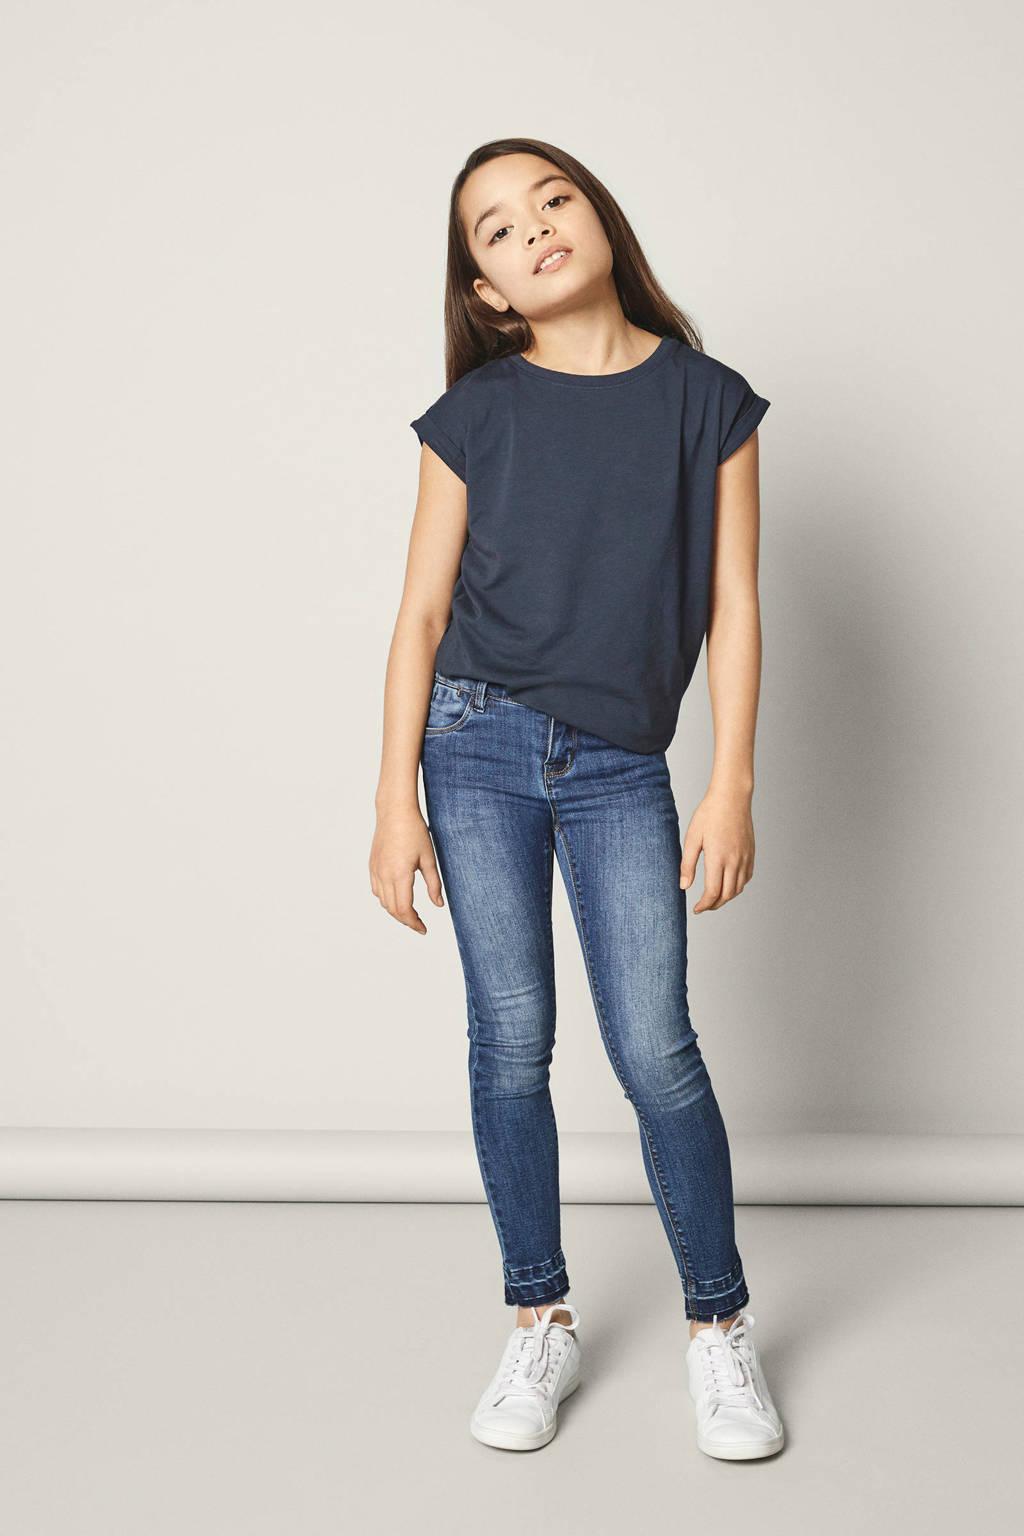 NAME IT KIDS super skinny jeans Polly 7/8 medium blue denim, Medium blue denim